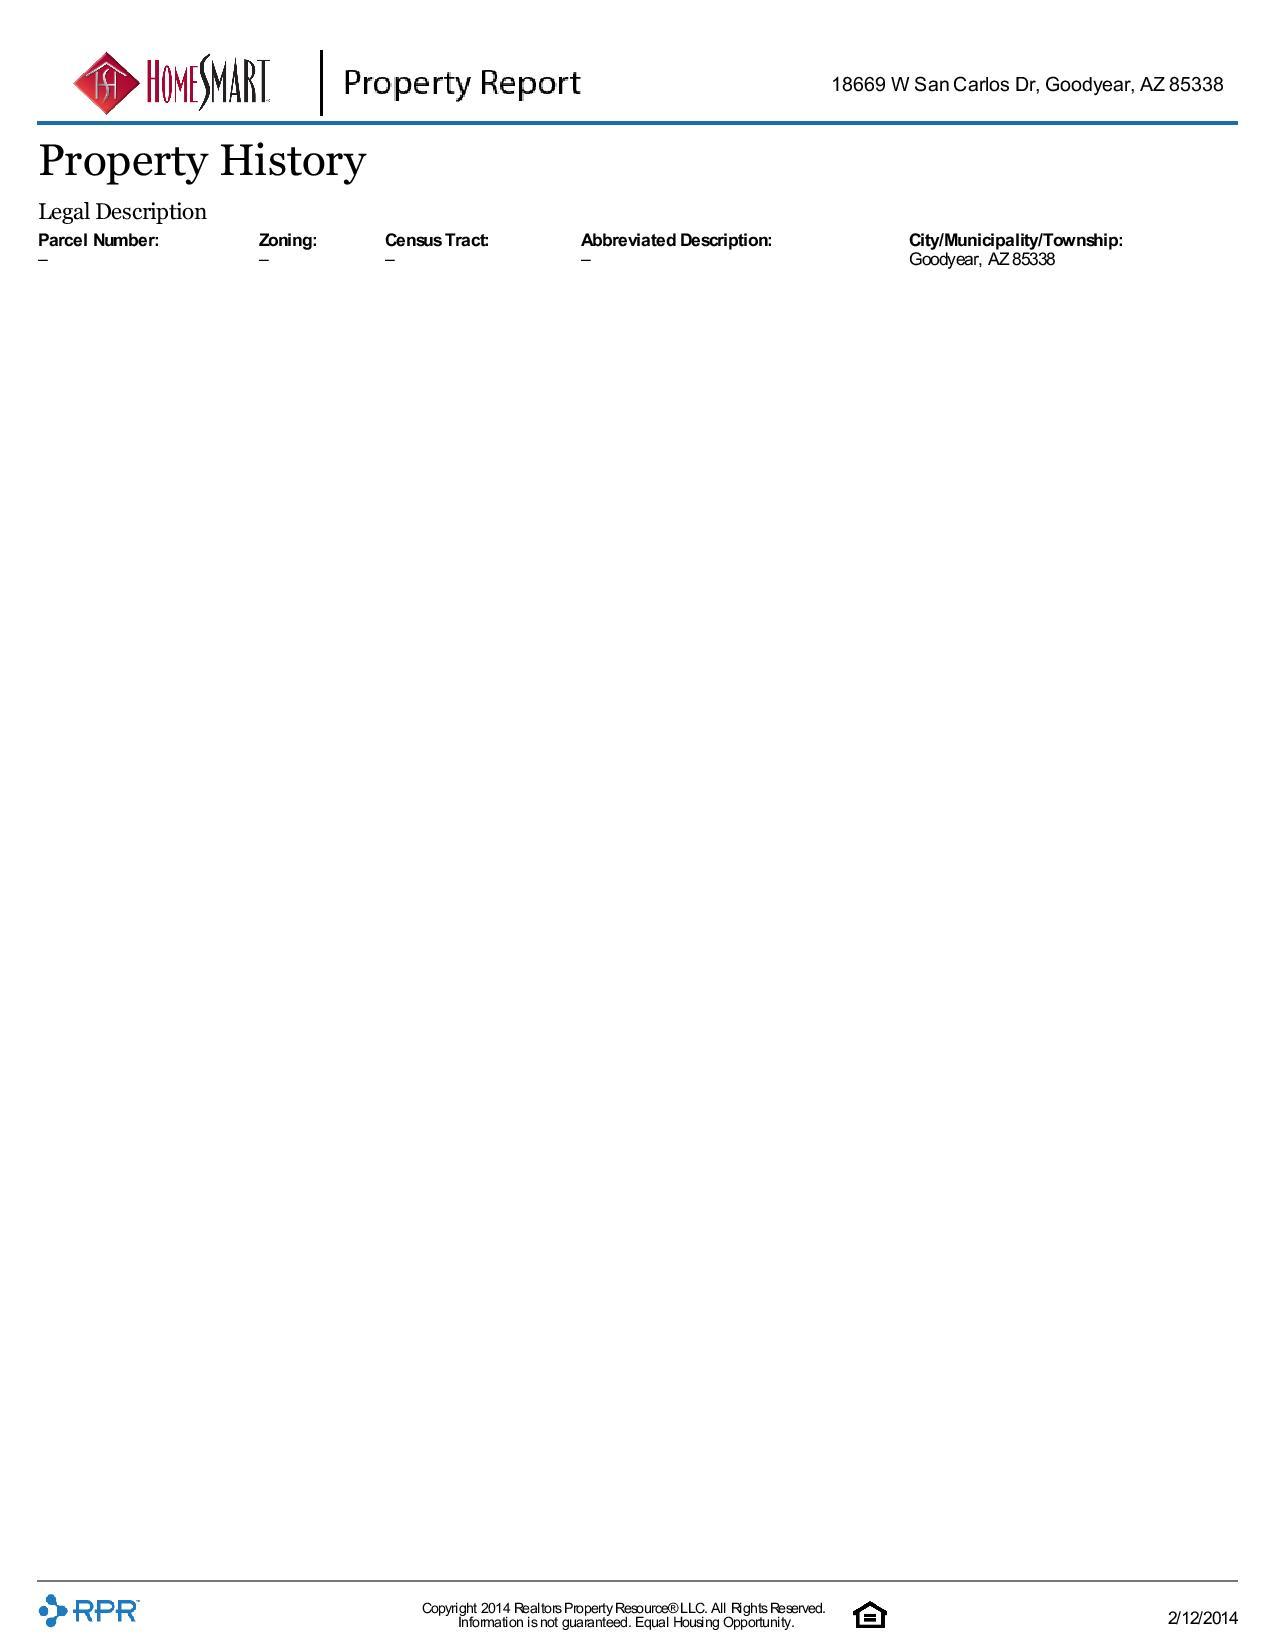 18669-W-San-Carlos-Dr-Goodyear-AZ-85338-page-007